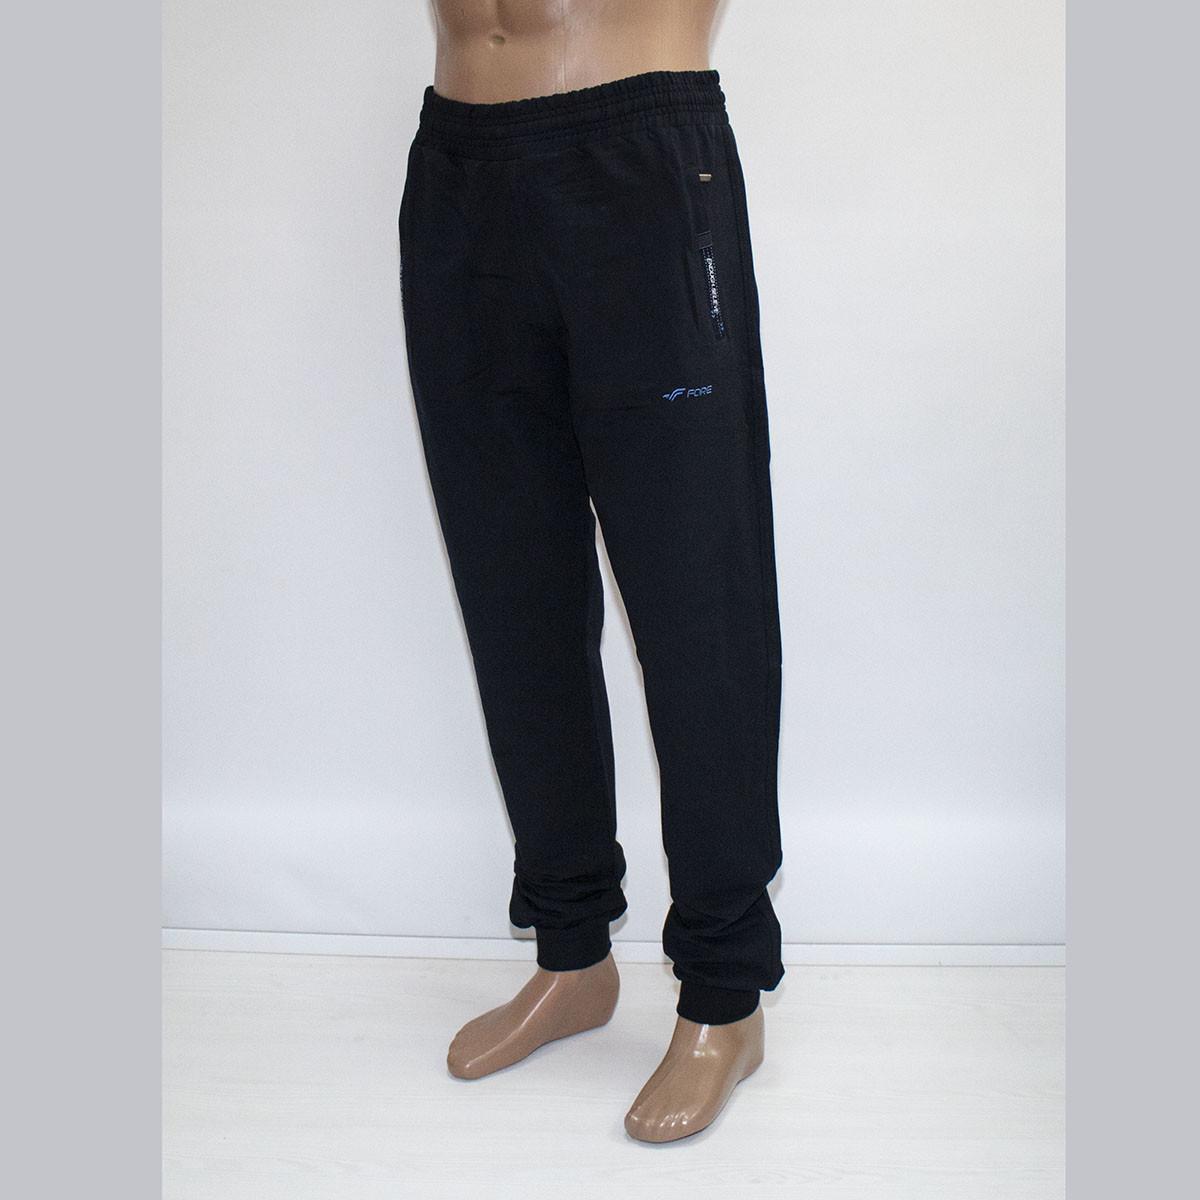 Мужские спортивные штаны на манжете M-3XL фабрика Турция тм. FORE 9610N